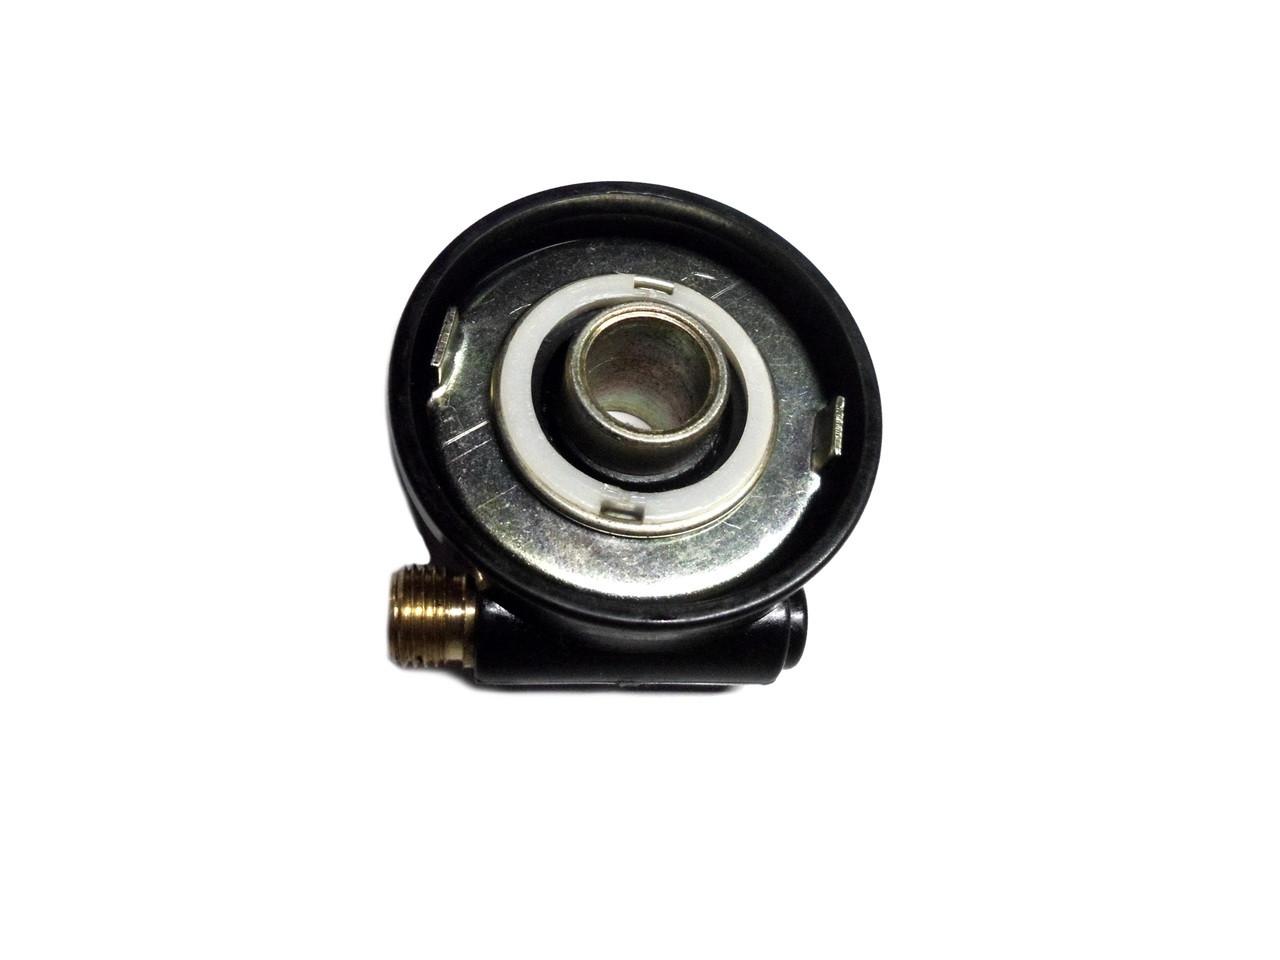 Original Kinetic Moped Speedometer Drive, Short Tab Version - Black